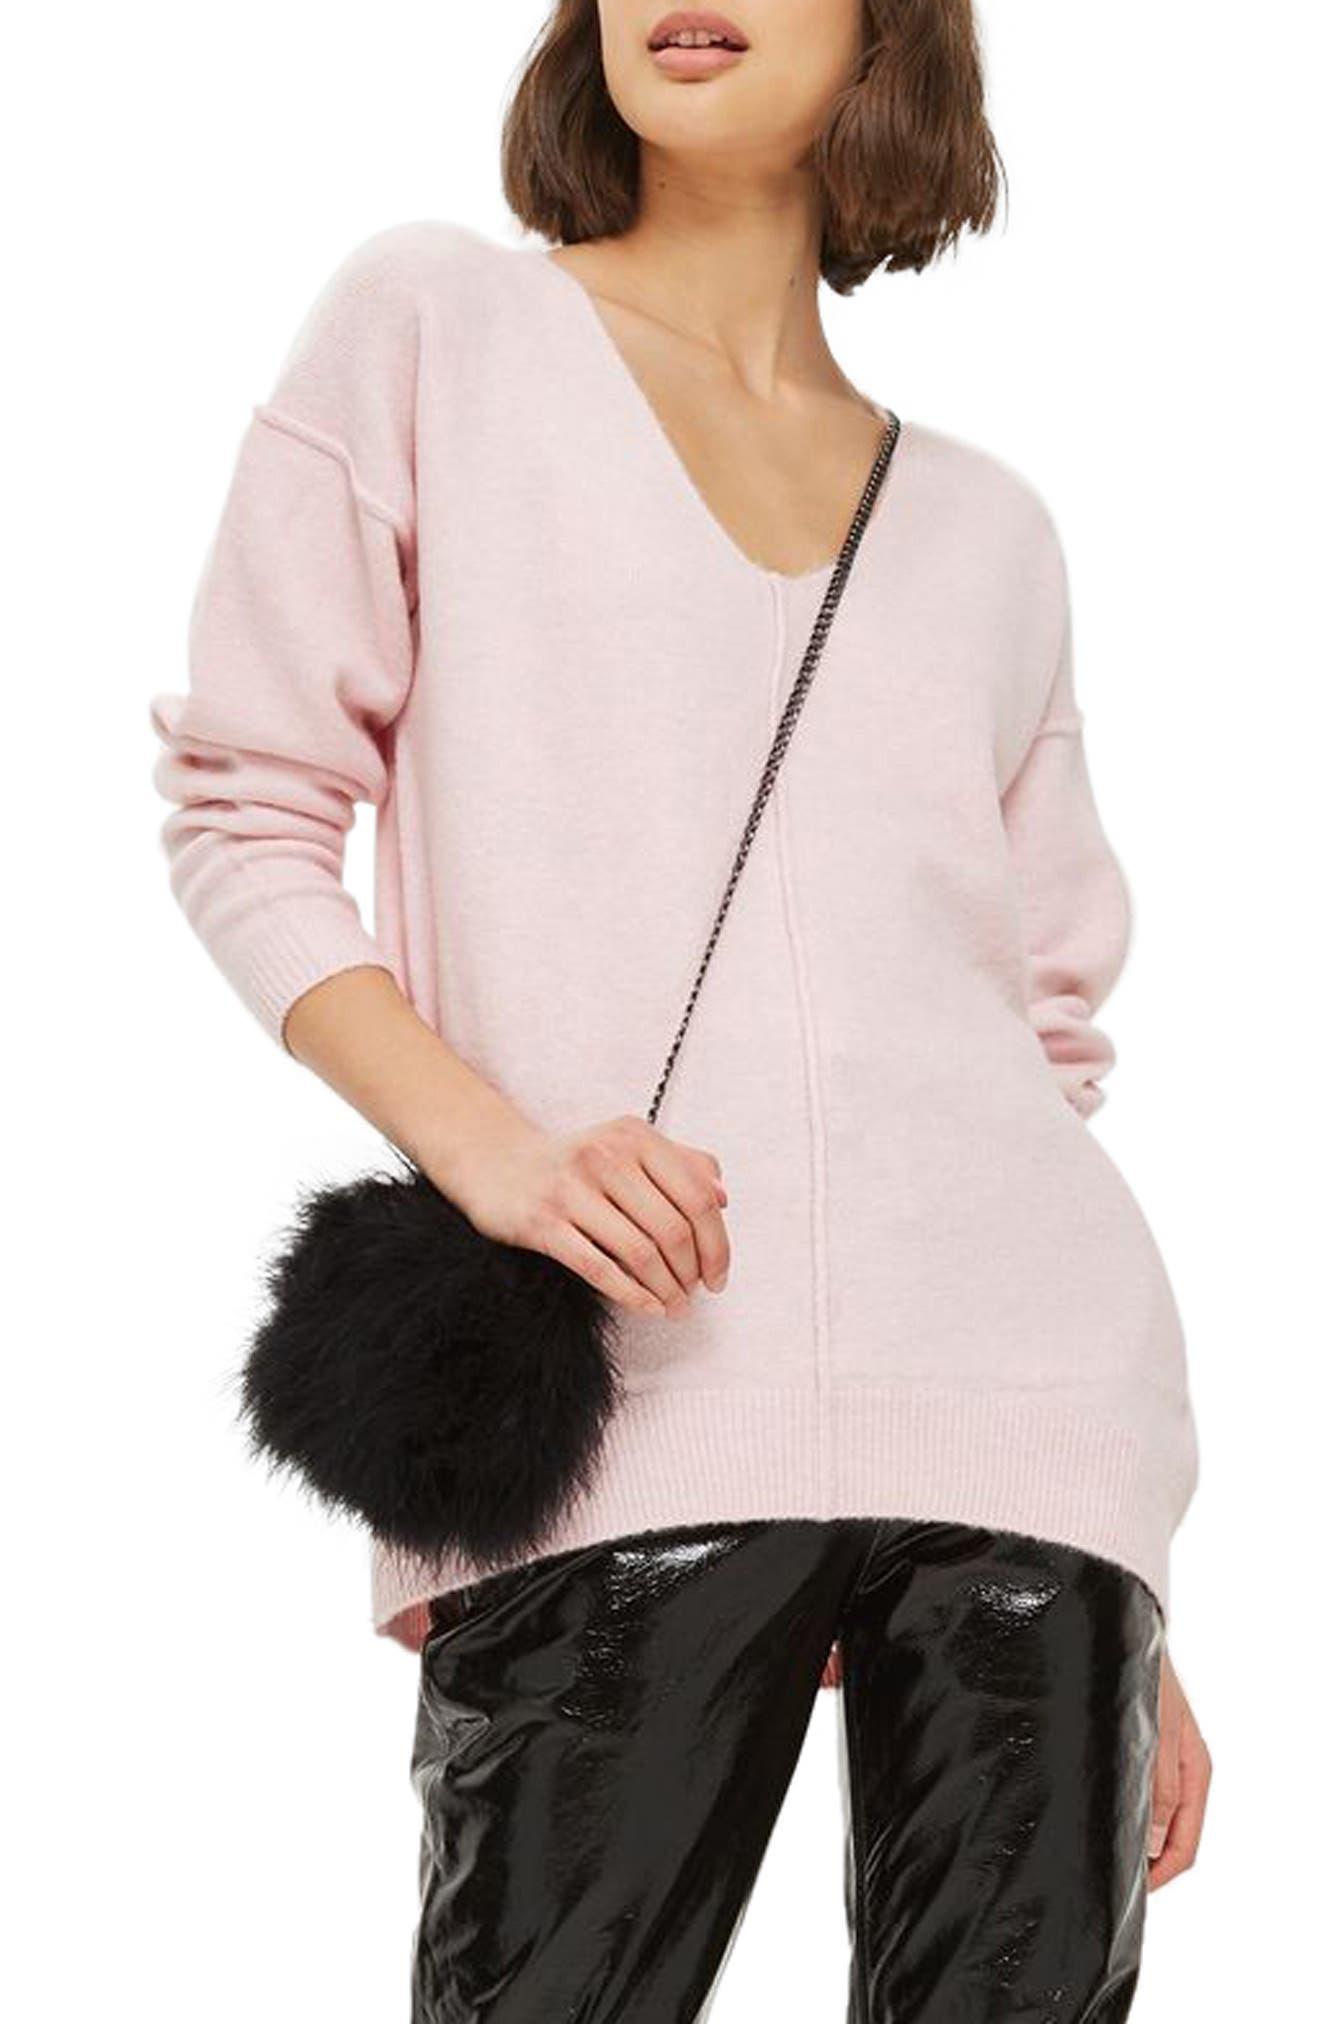 Alternate Image 1 Selected - Topshop Exposed Seam Longline Sweater